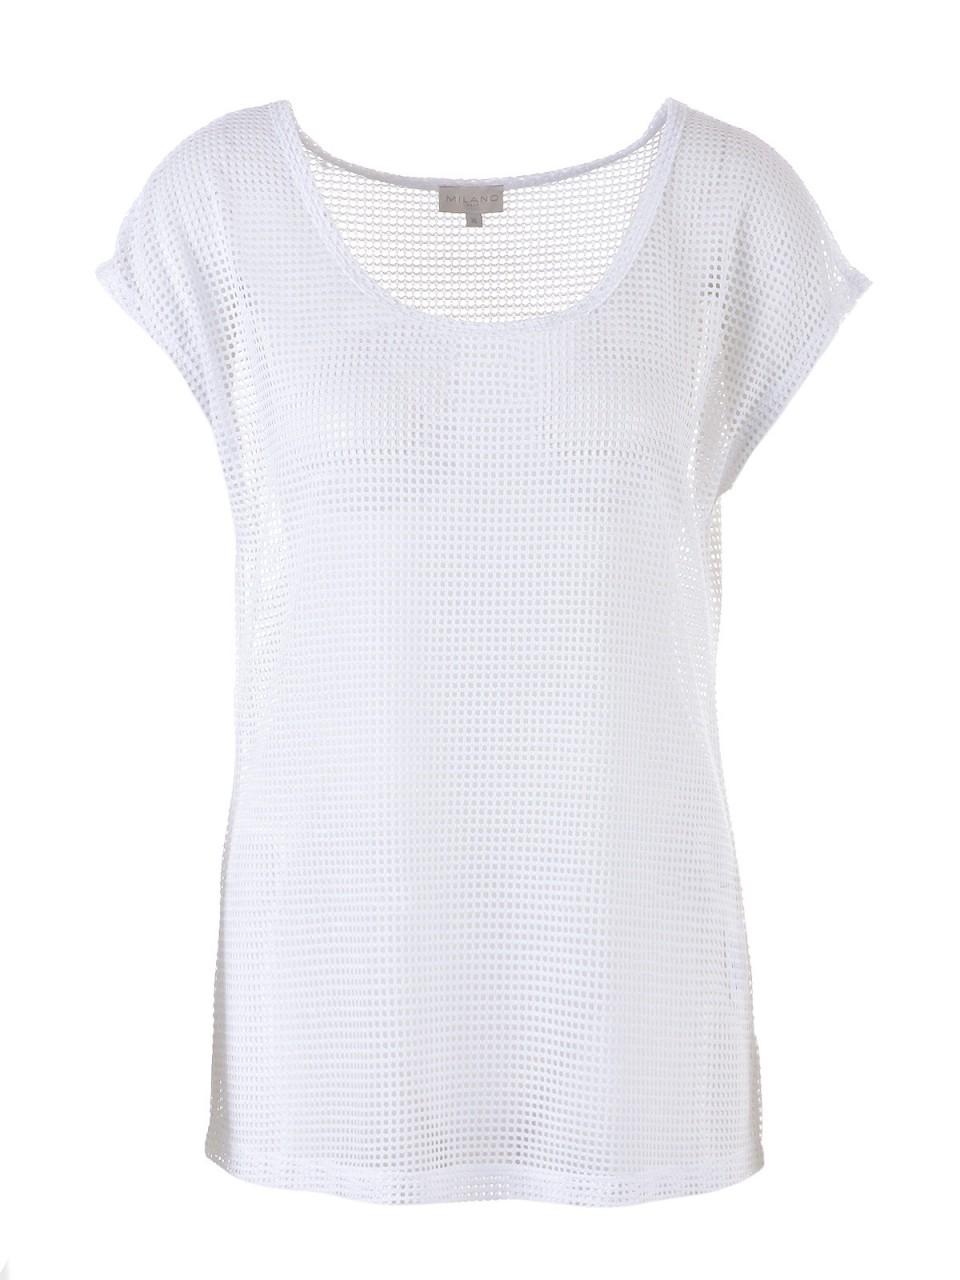 milano-italy-damen-t-shirt-wei-szlig-